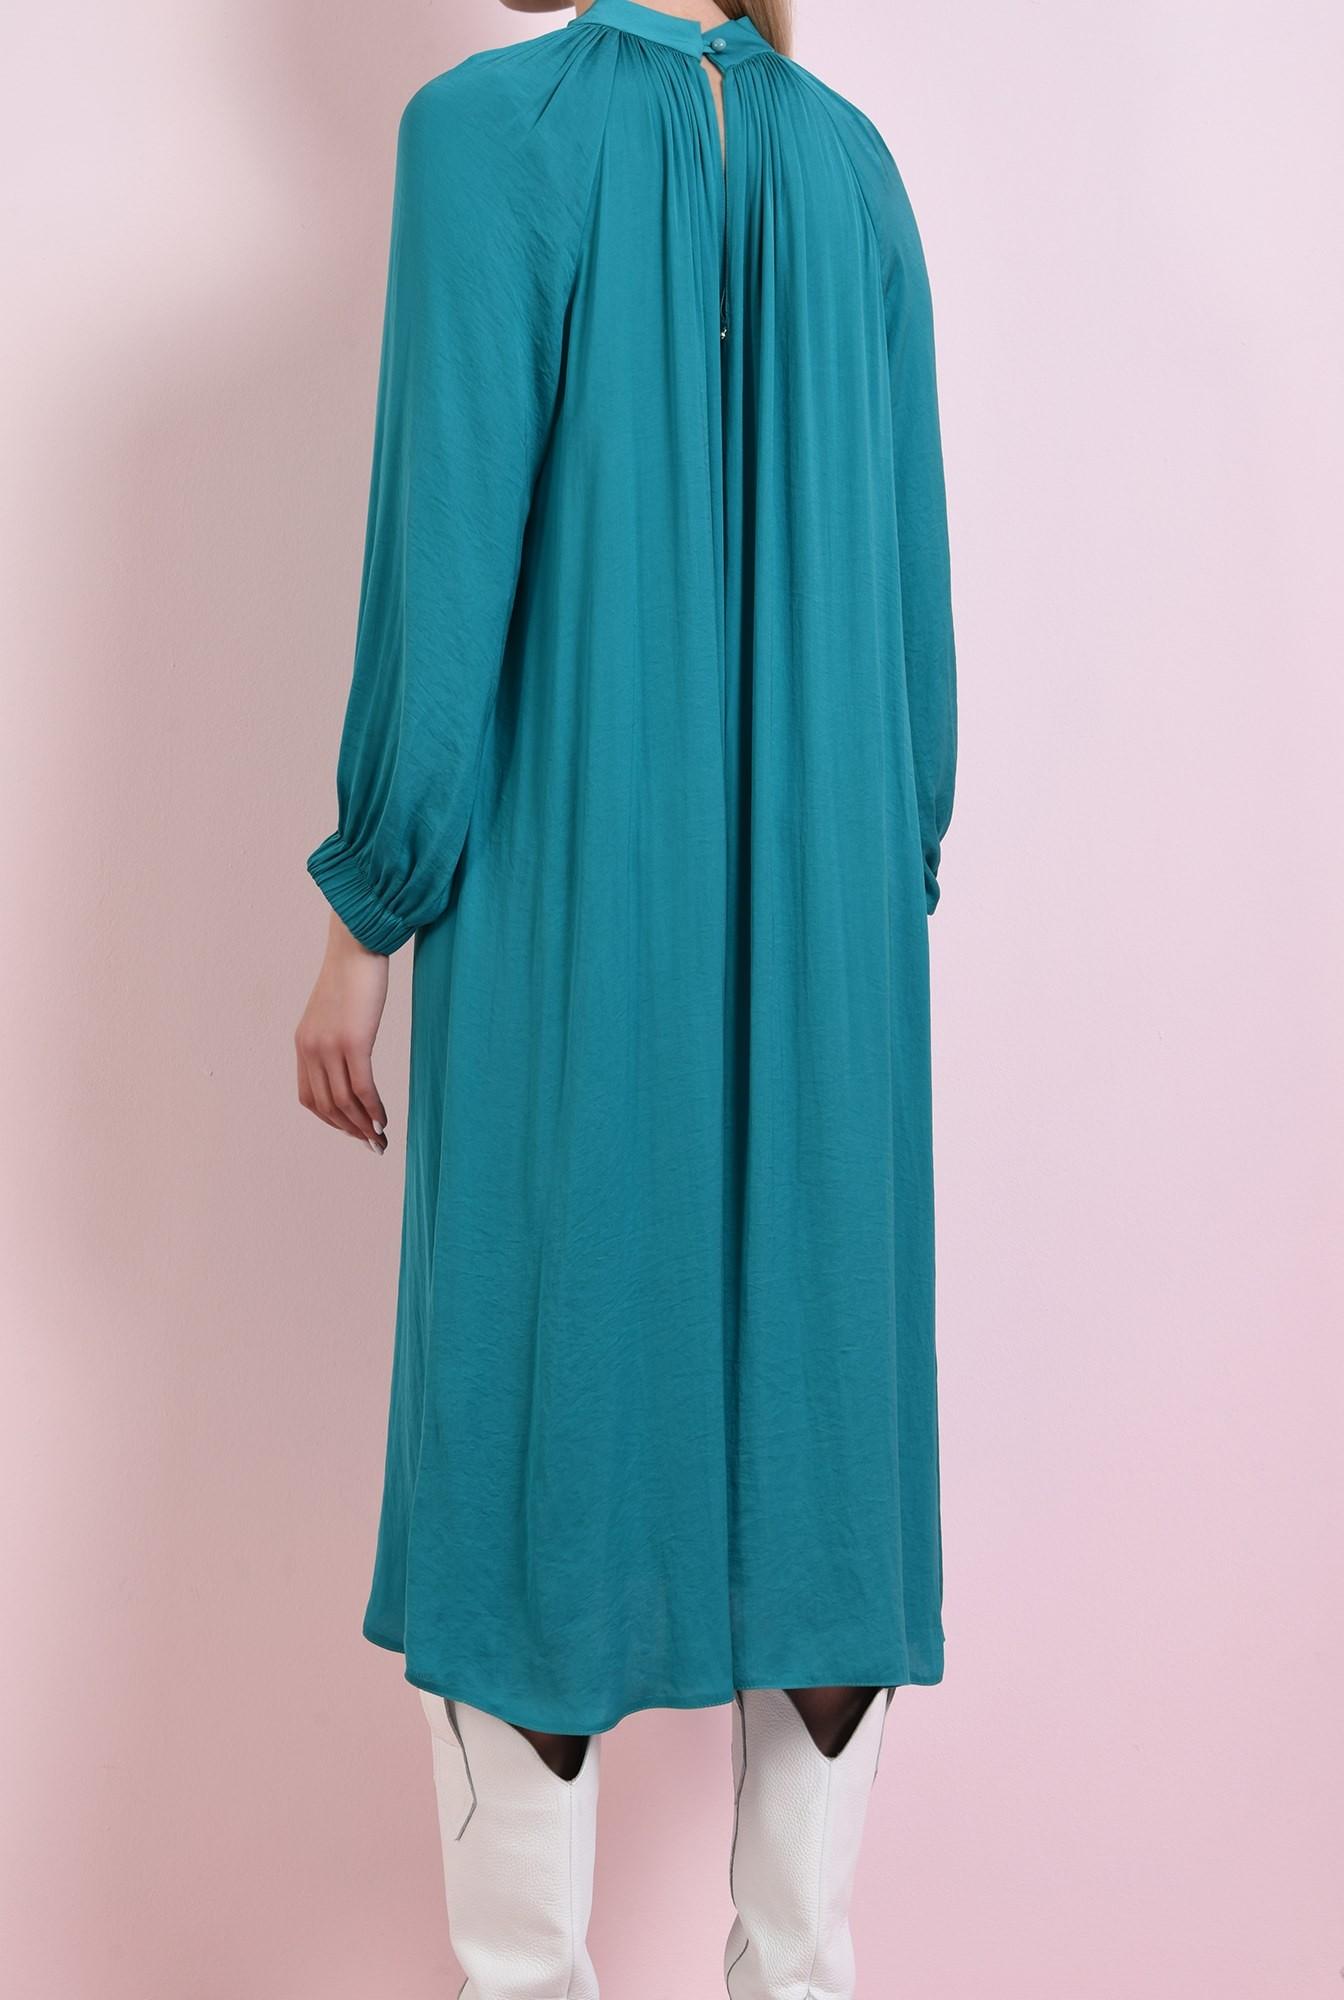 2 - 360 - rochie midi, verde, din satin